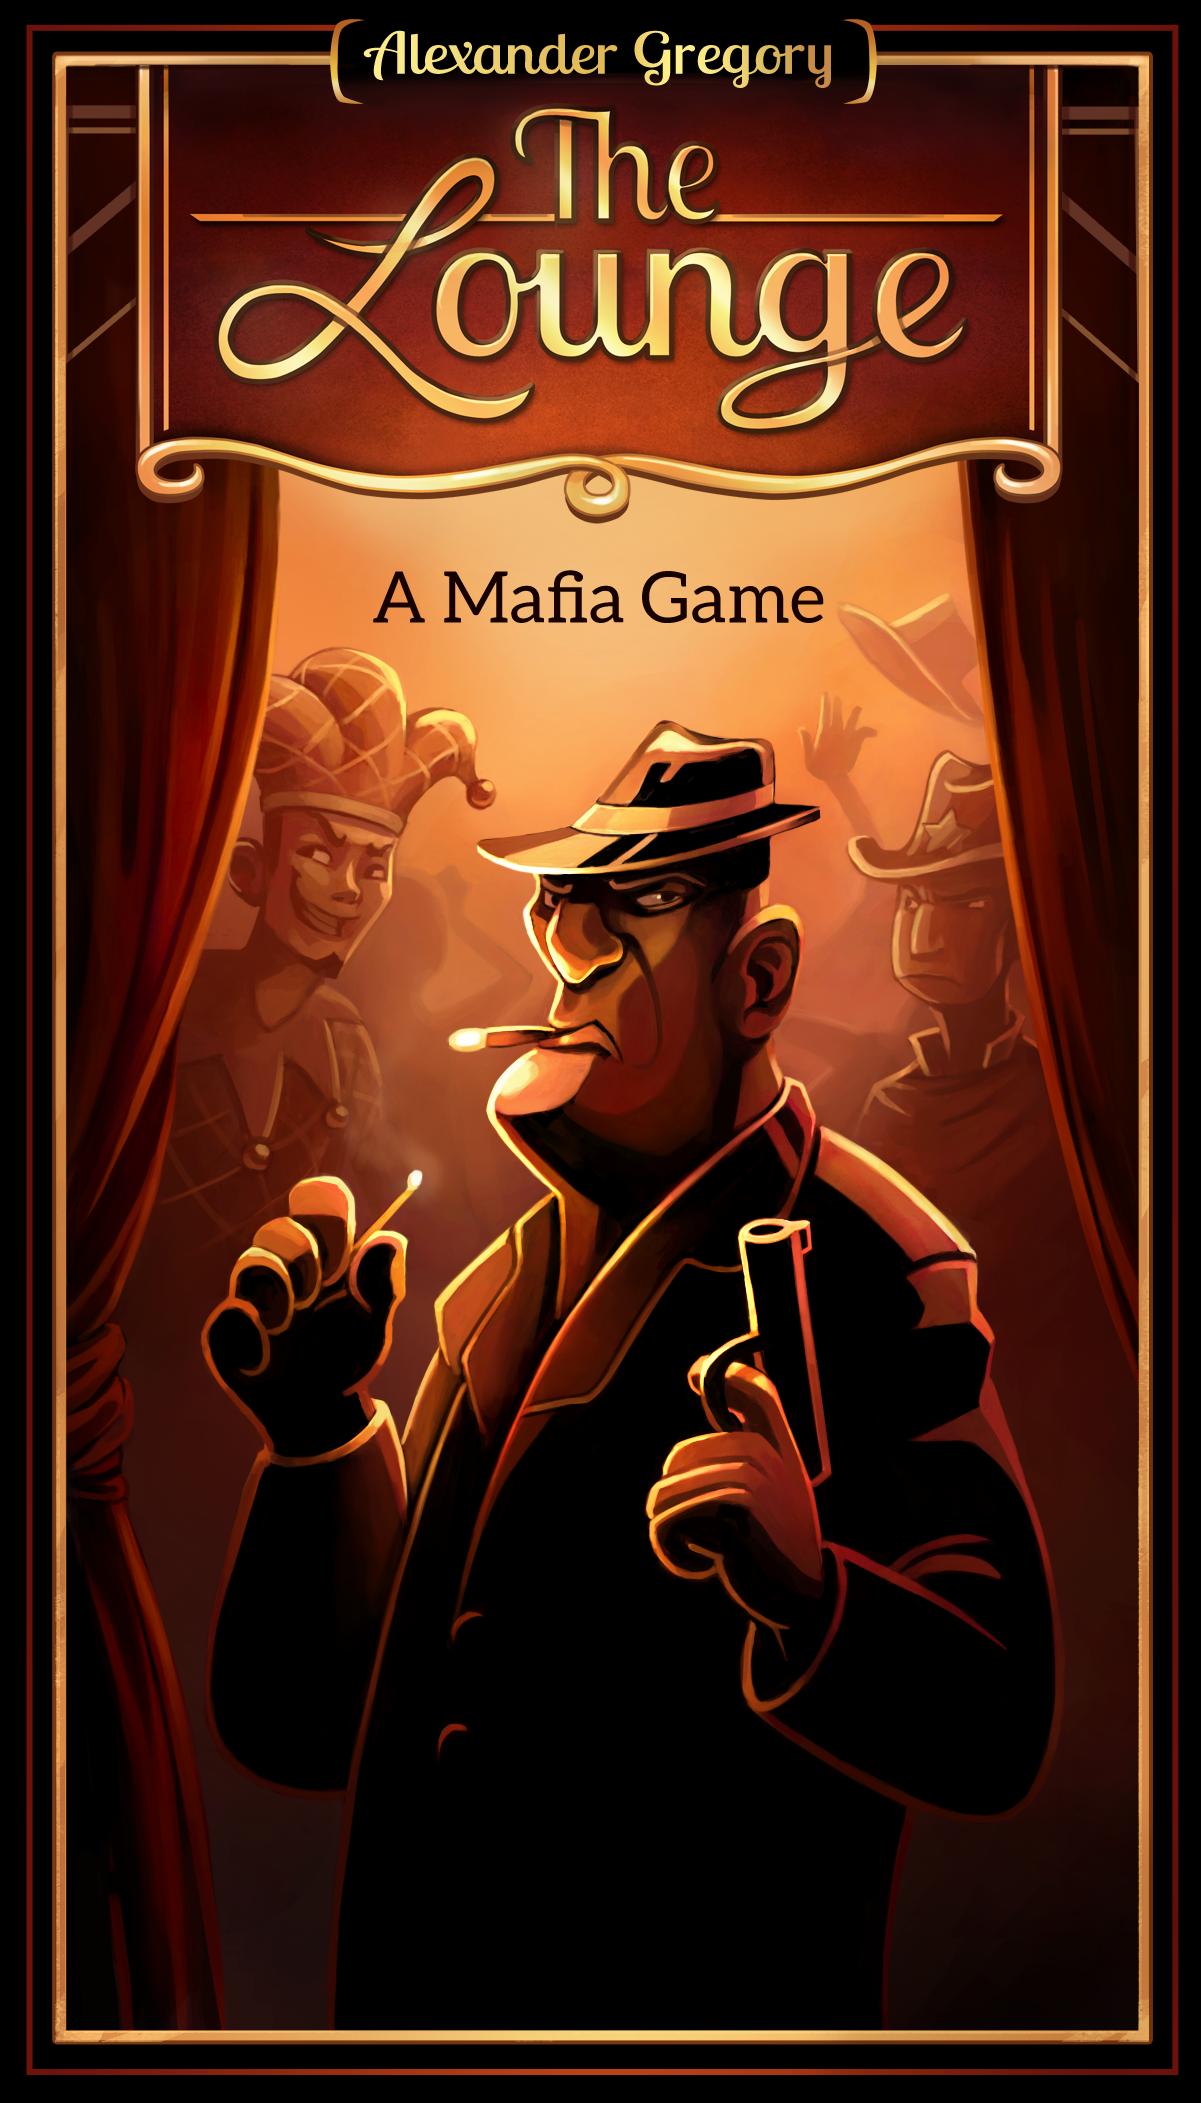 The Lounge A Mafia Game Mafia game, Mafia, Games